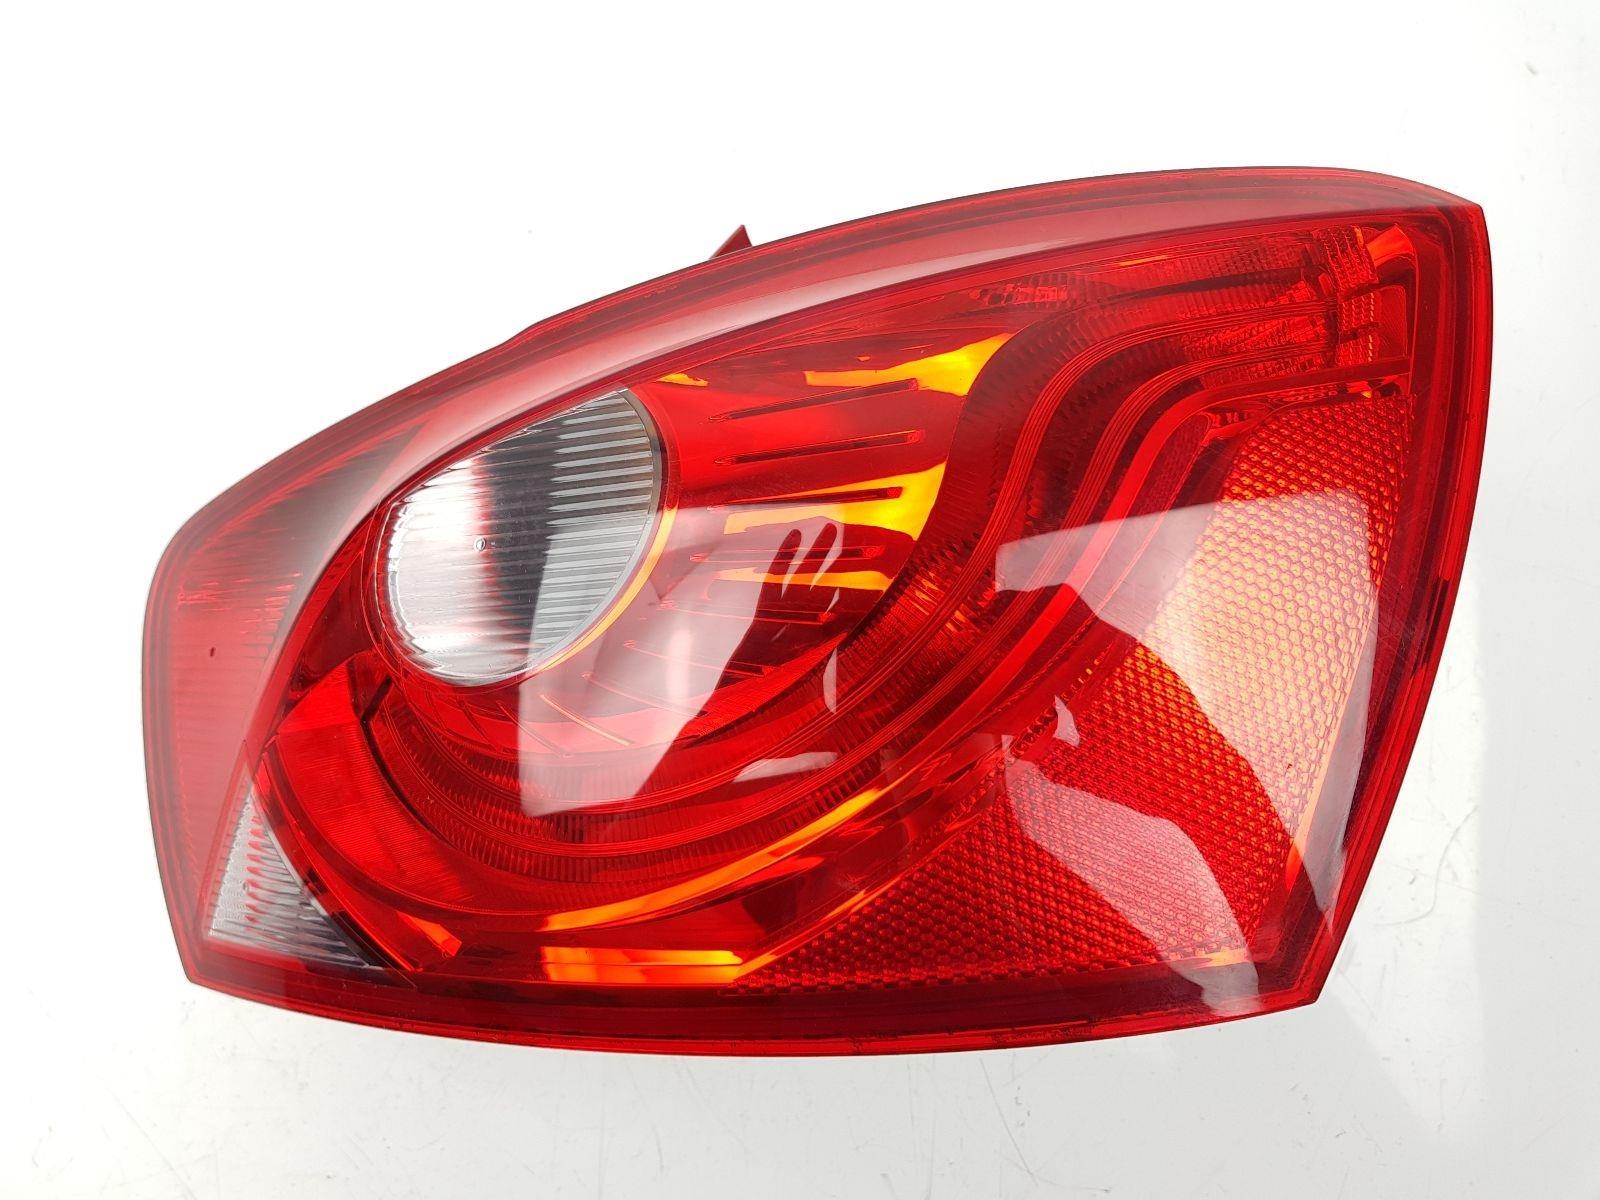 seat ibiza 2009 to 2012 lamp assembly rear rh petrol manual for rh scbvehicledismantlers co uk manual seat ibiza 97 pdf 2018 Seat Ibiza